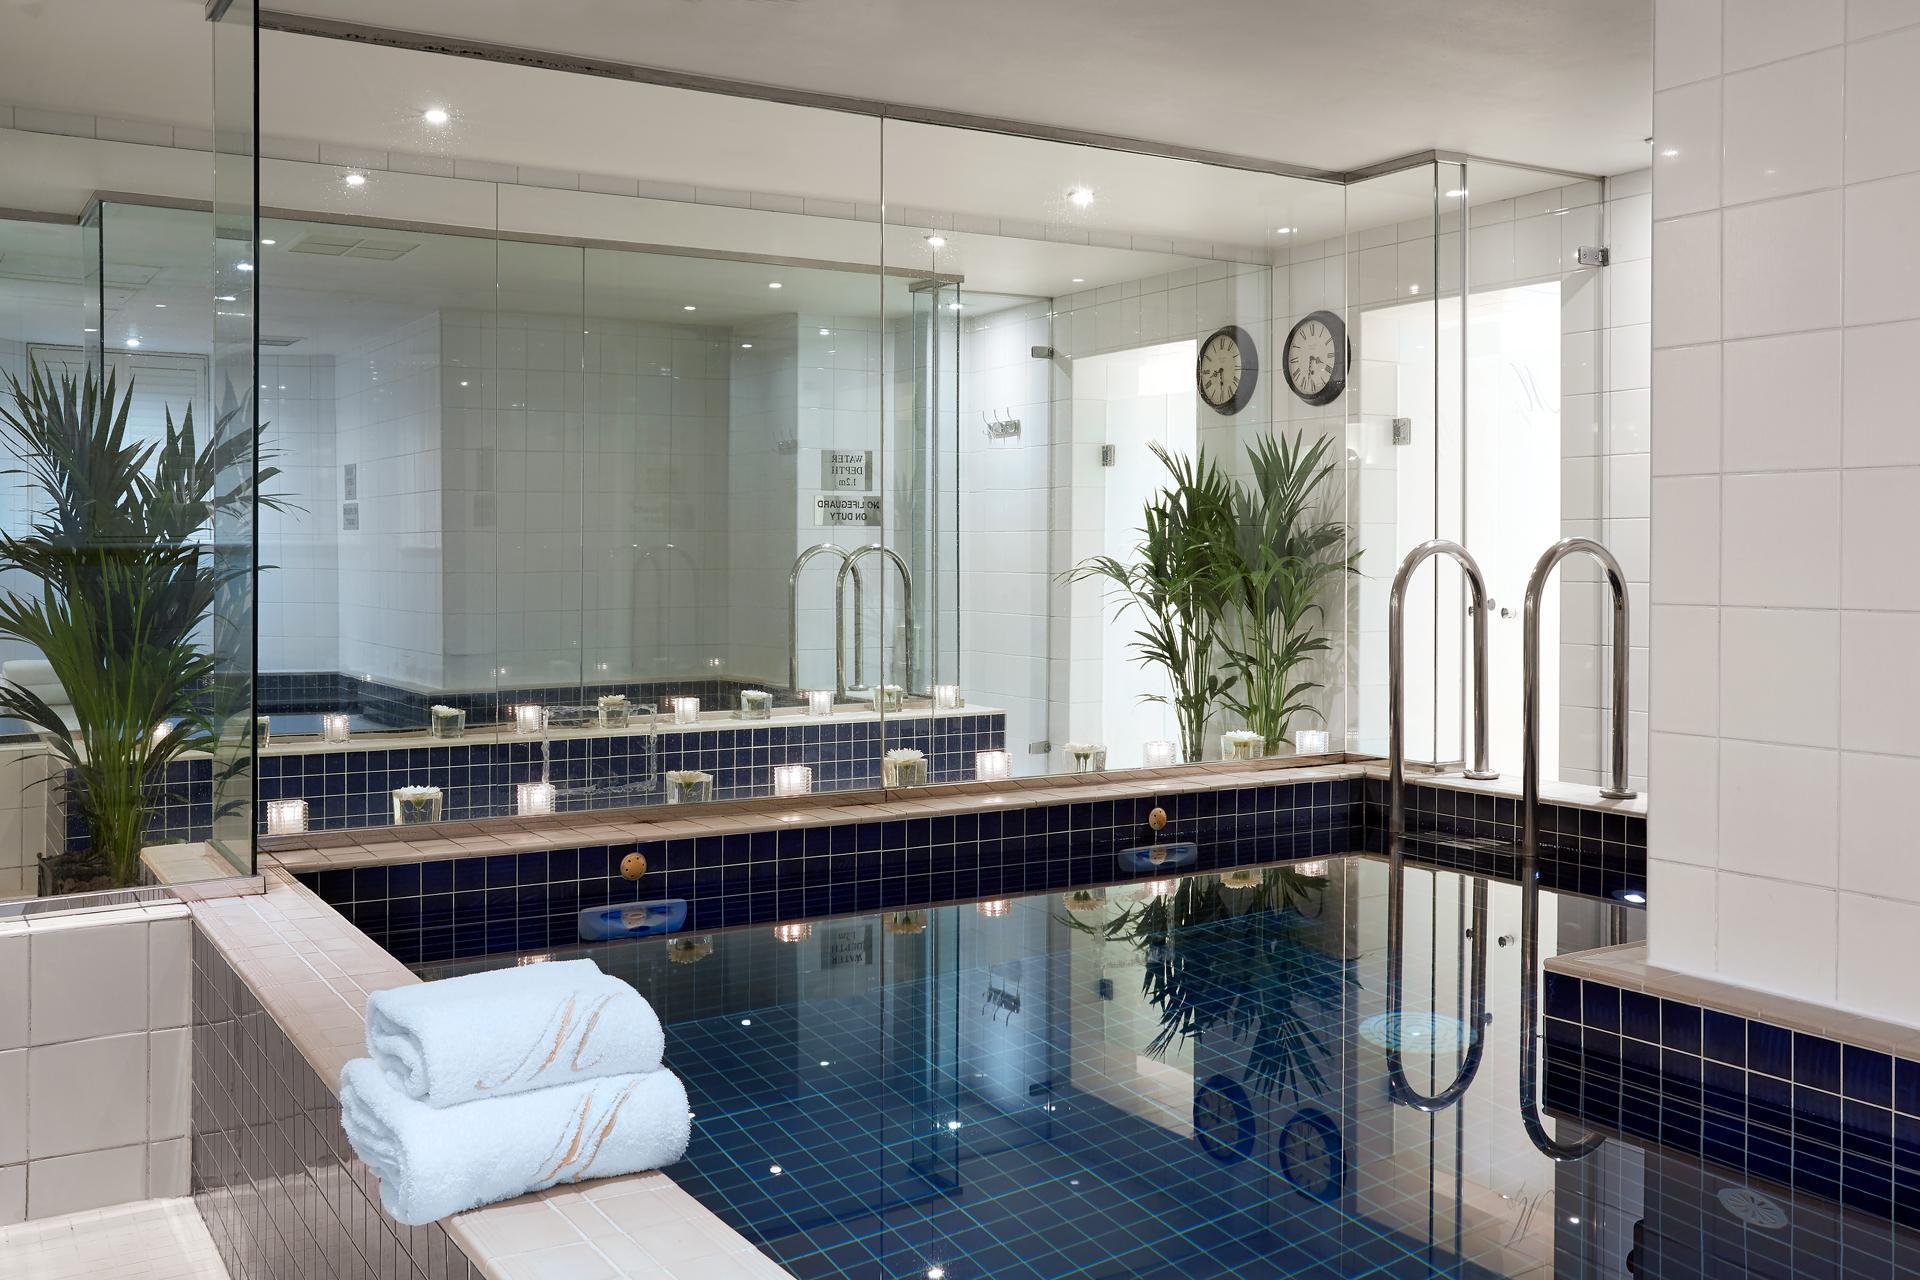 The Milestone resistance swimming pool